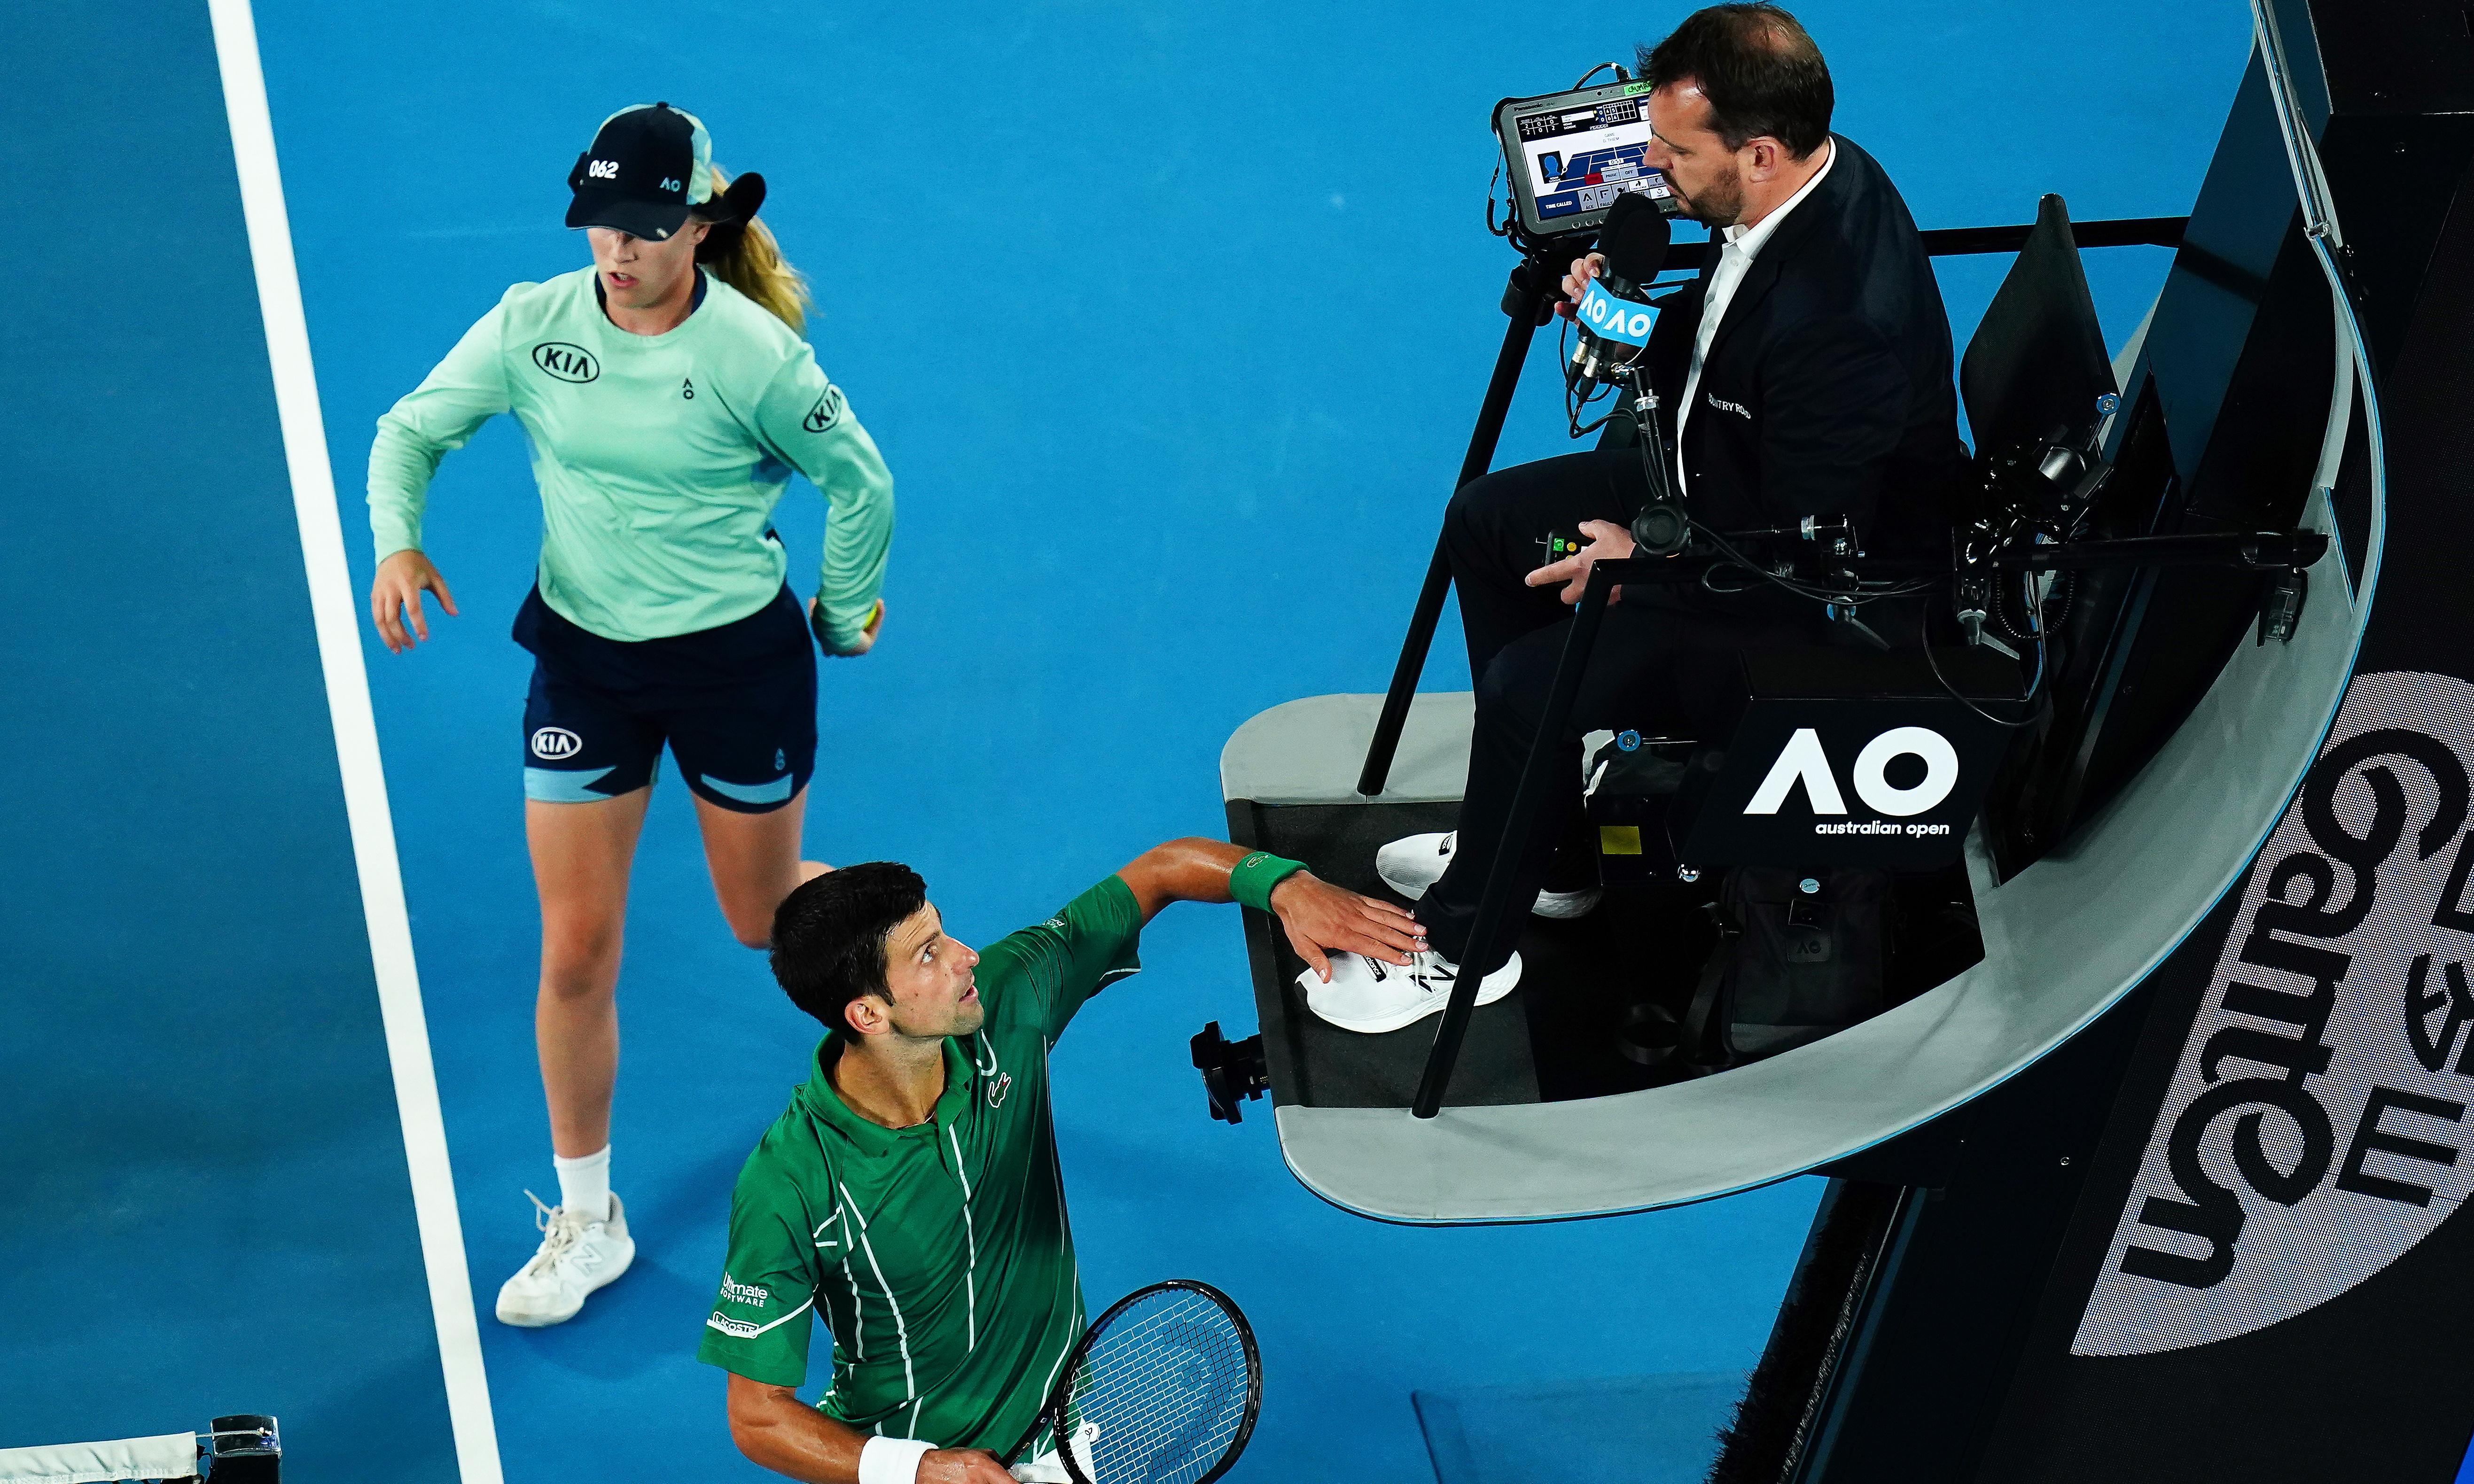 Novak Djokovic says he did not overstep mark when touching umpire's shoe